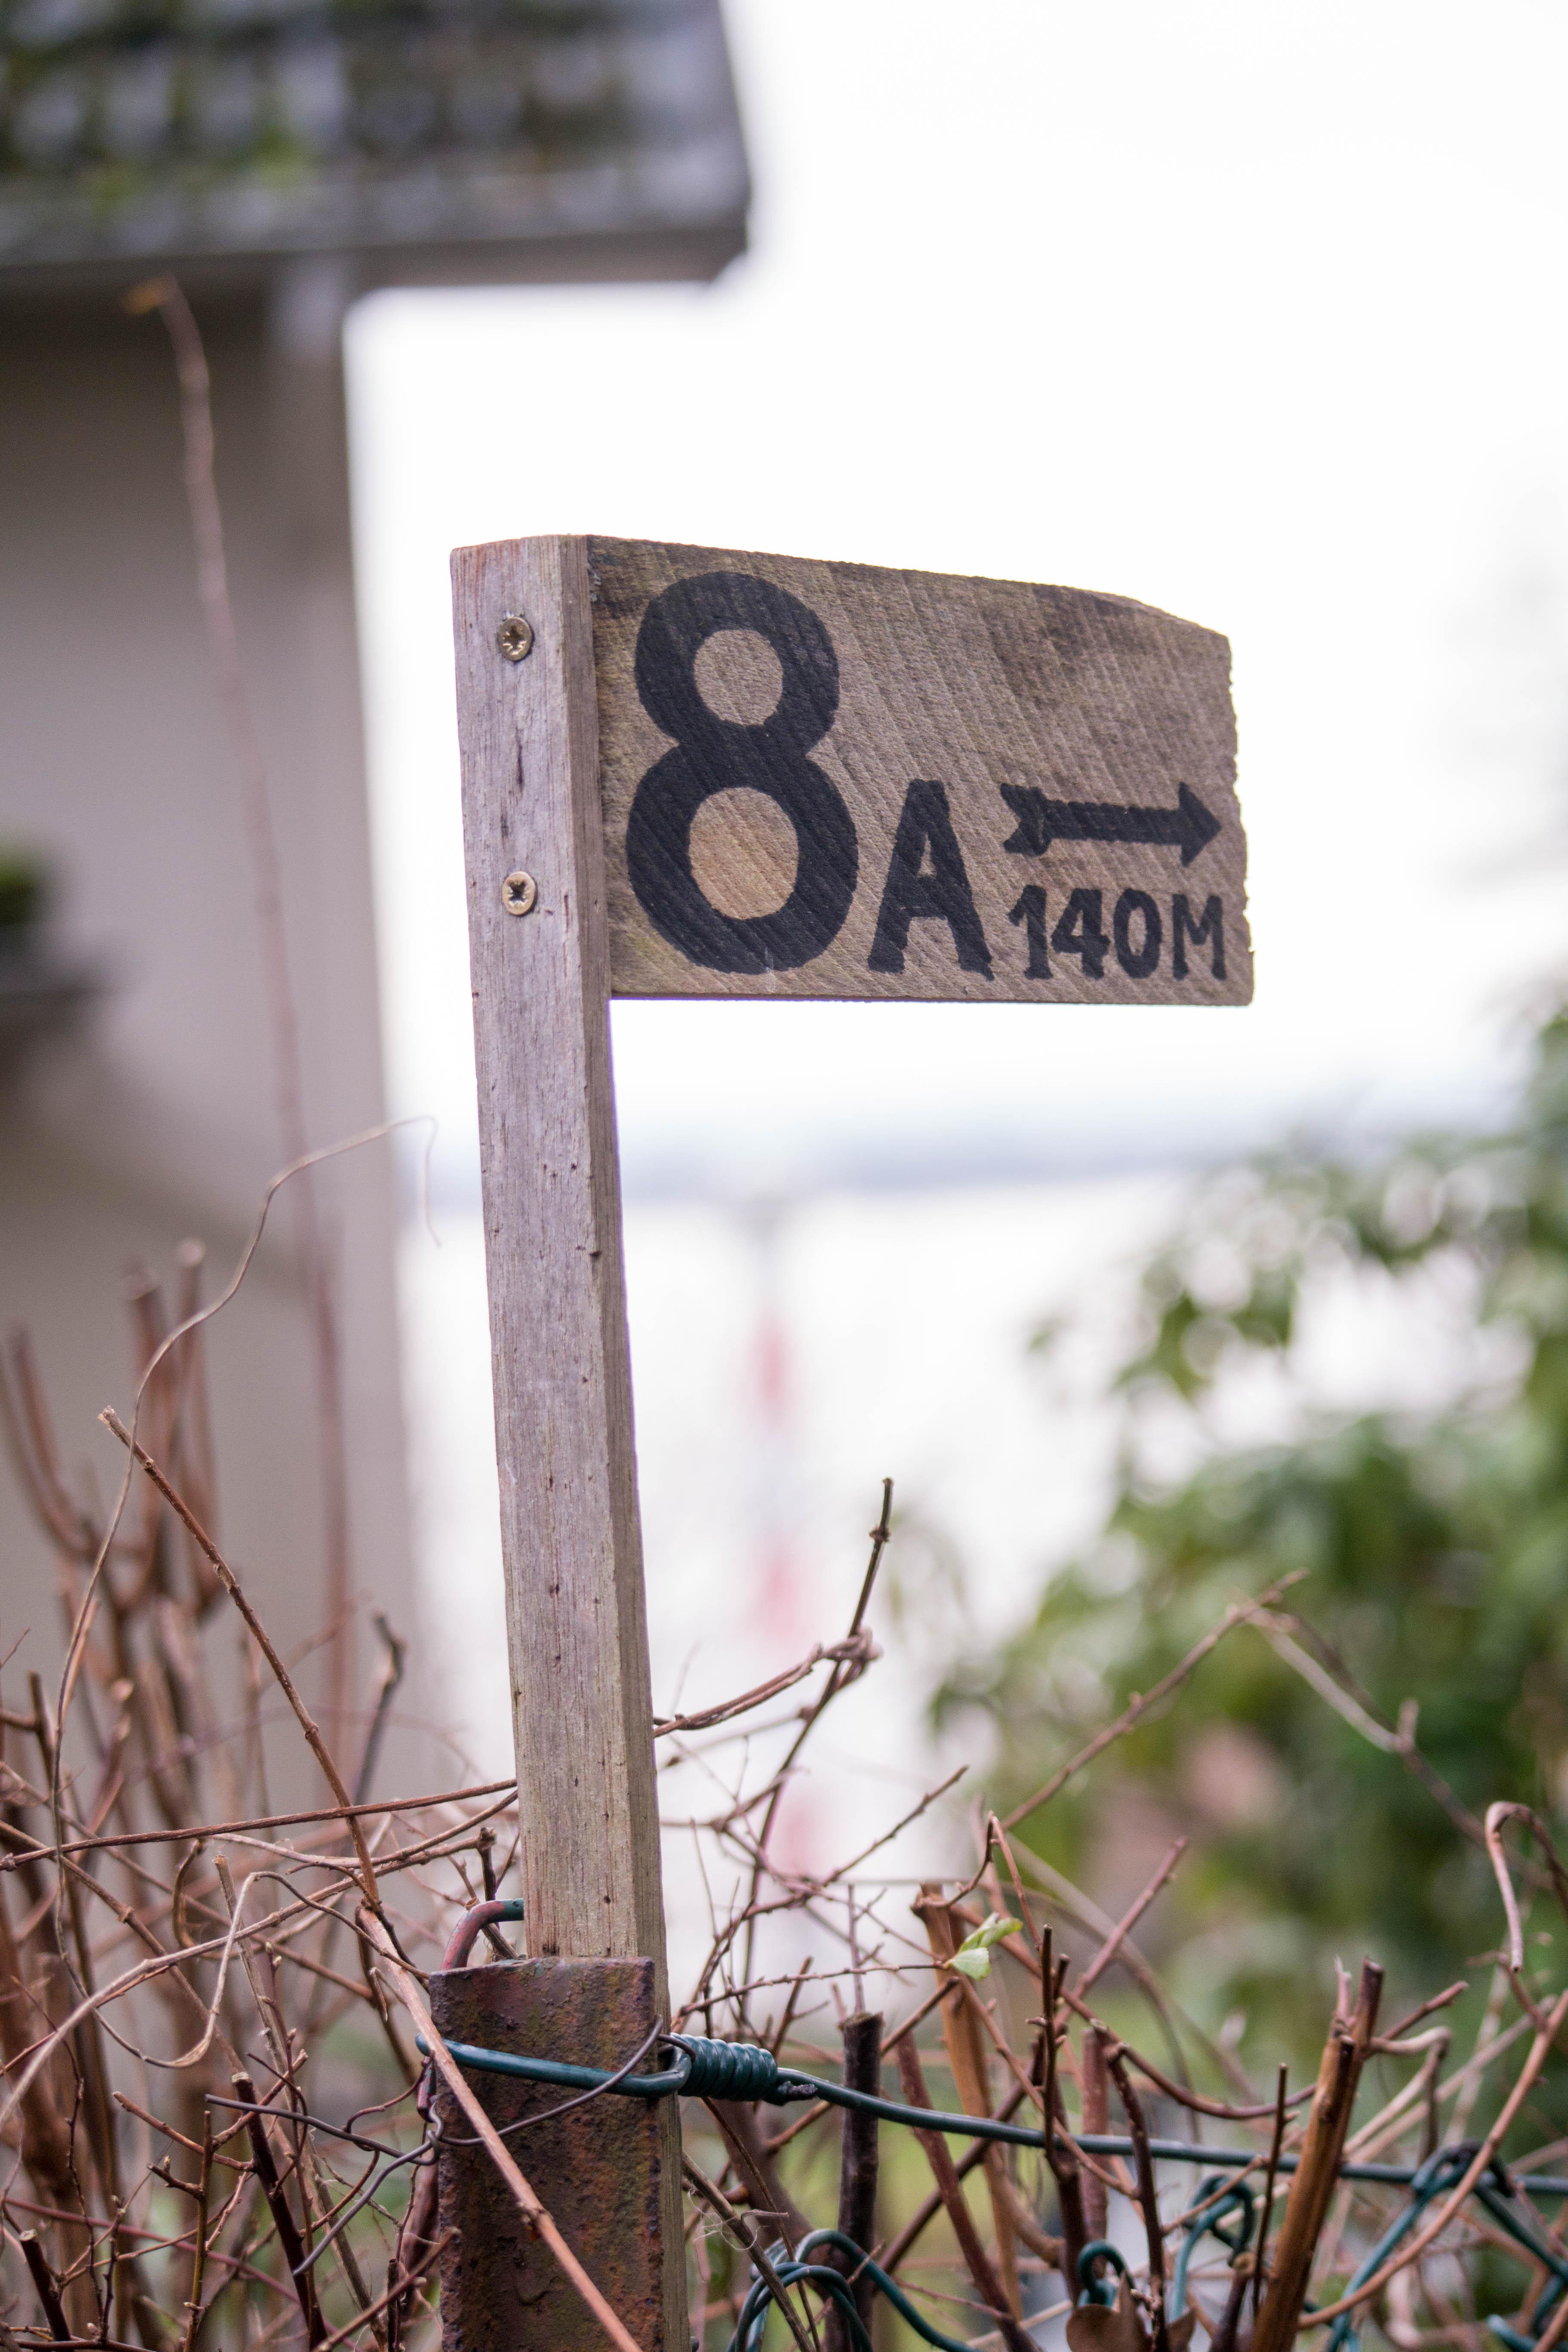 Hausnummernschild 8 A